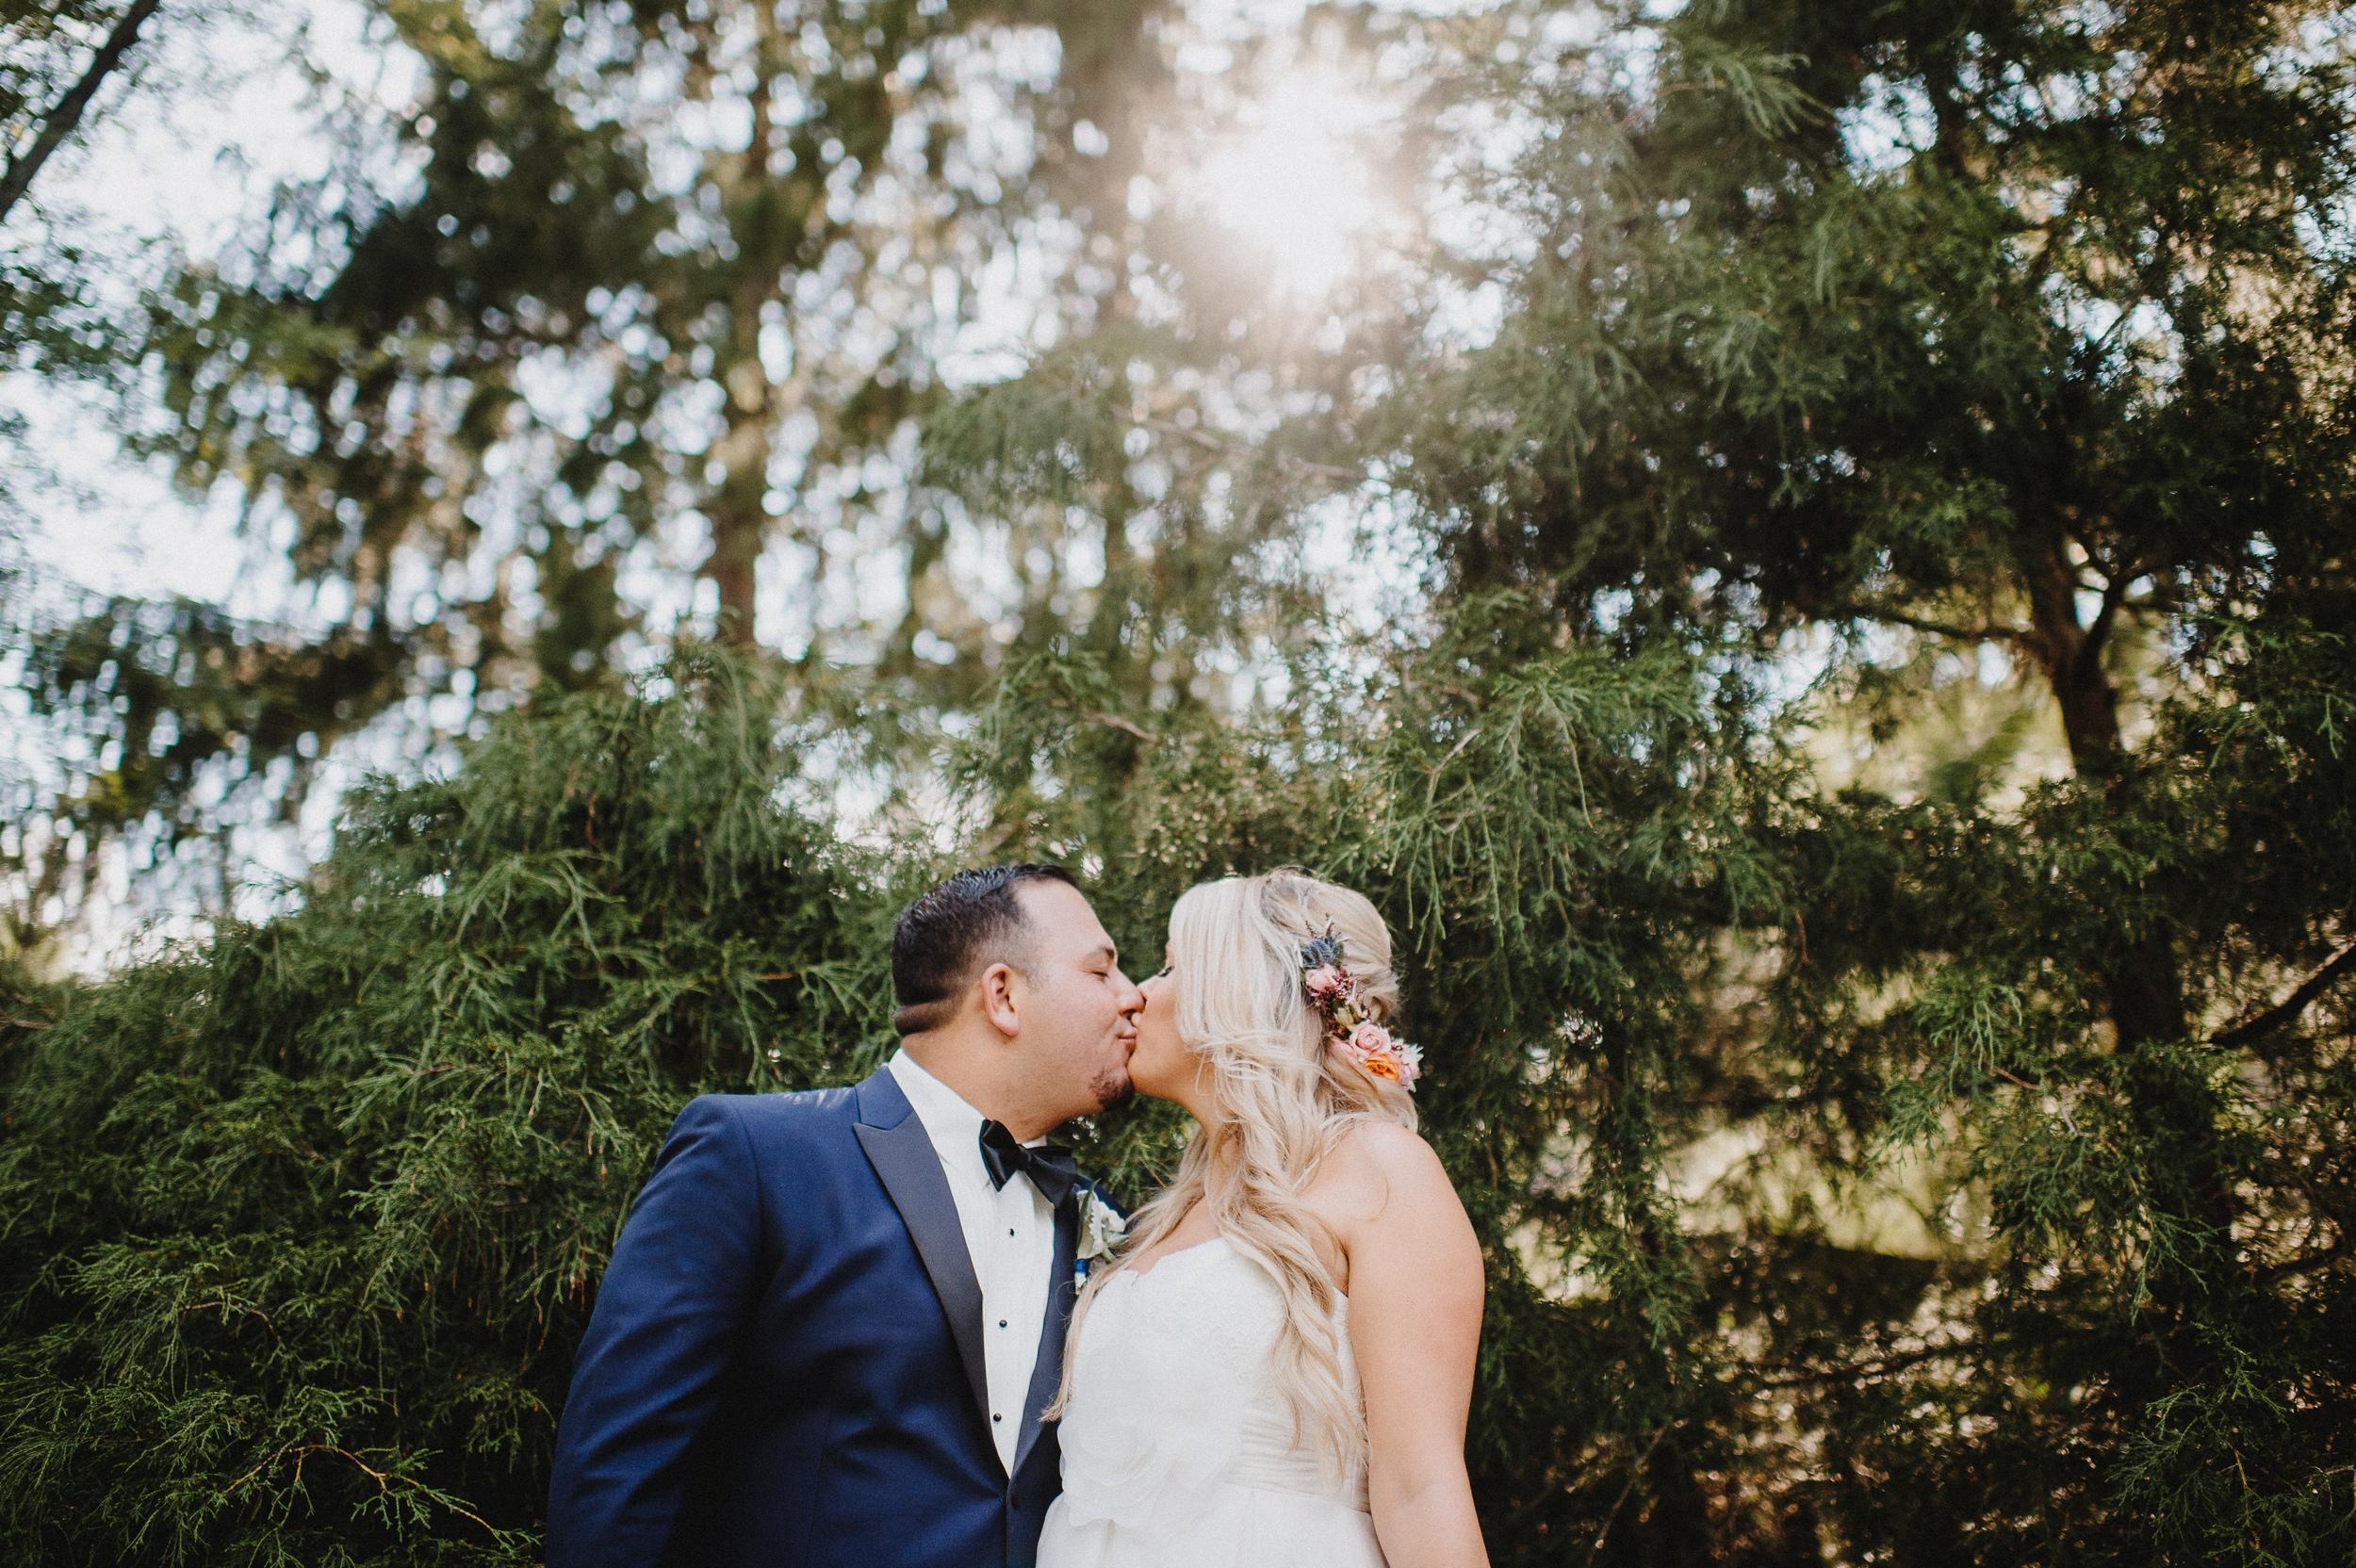 holly-hedge-estate-wedding-photographer-pat-robinson-photography-43.jpg